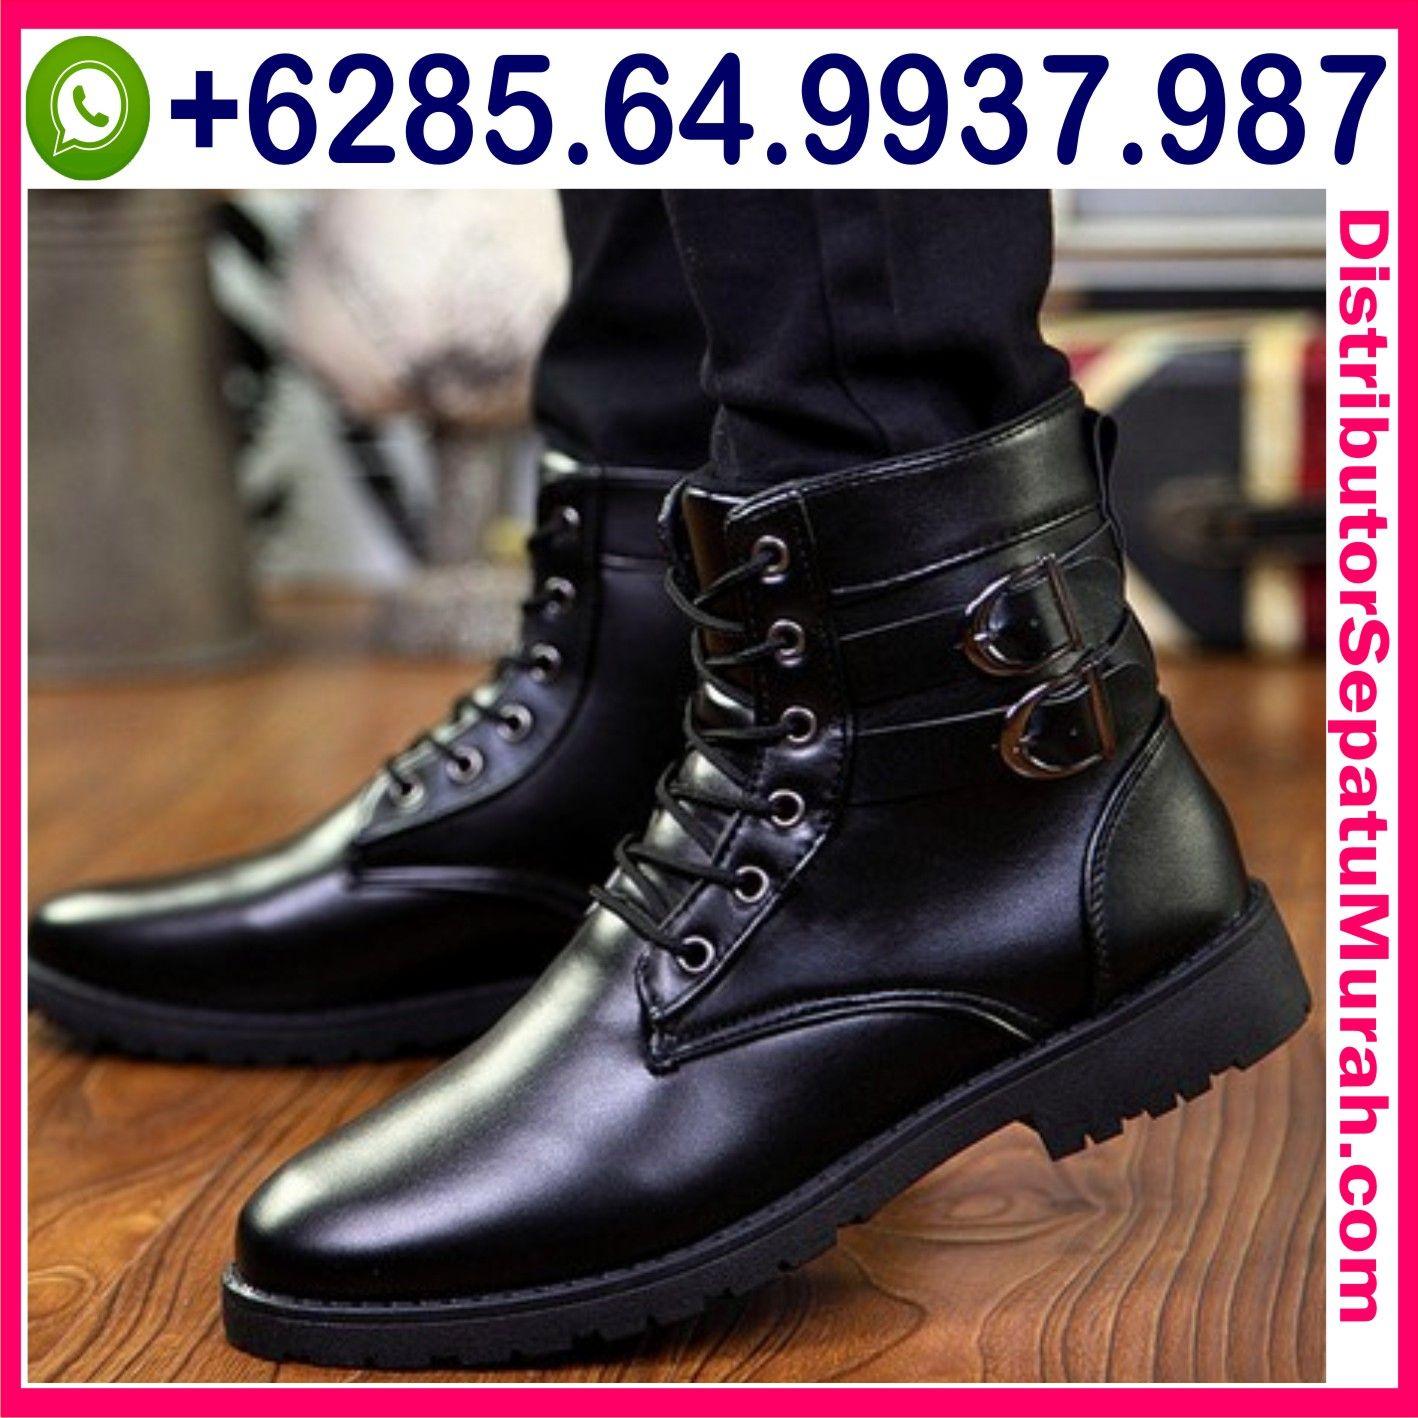 Sepatu Pria Sepatu Pria Sepatu Pria